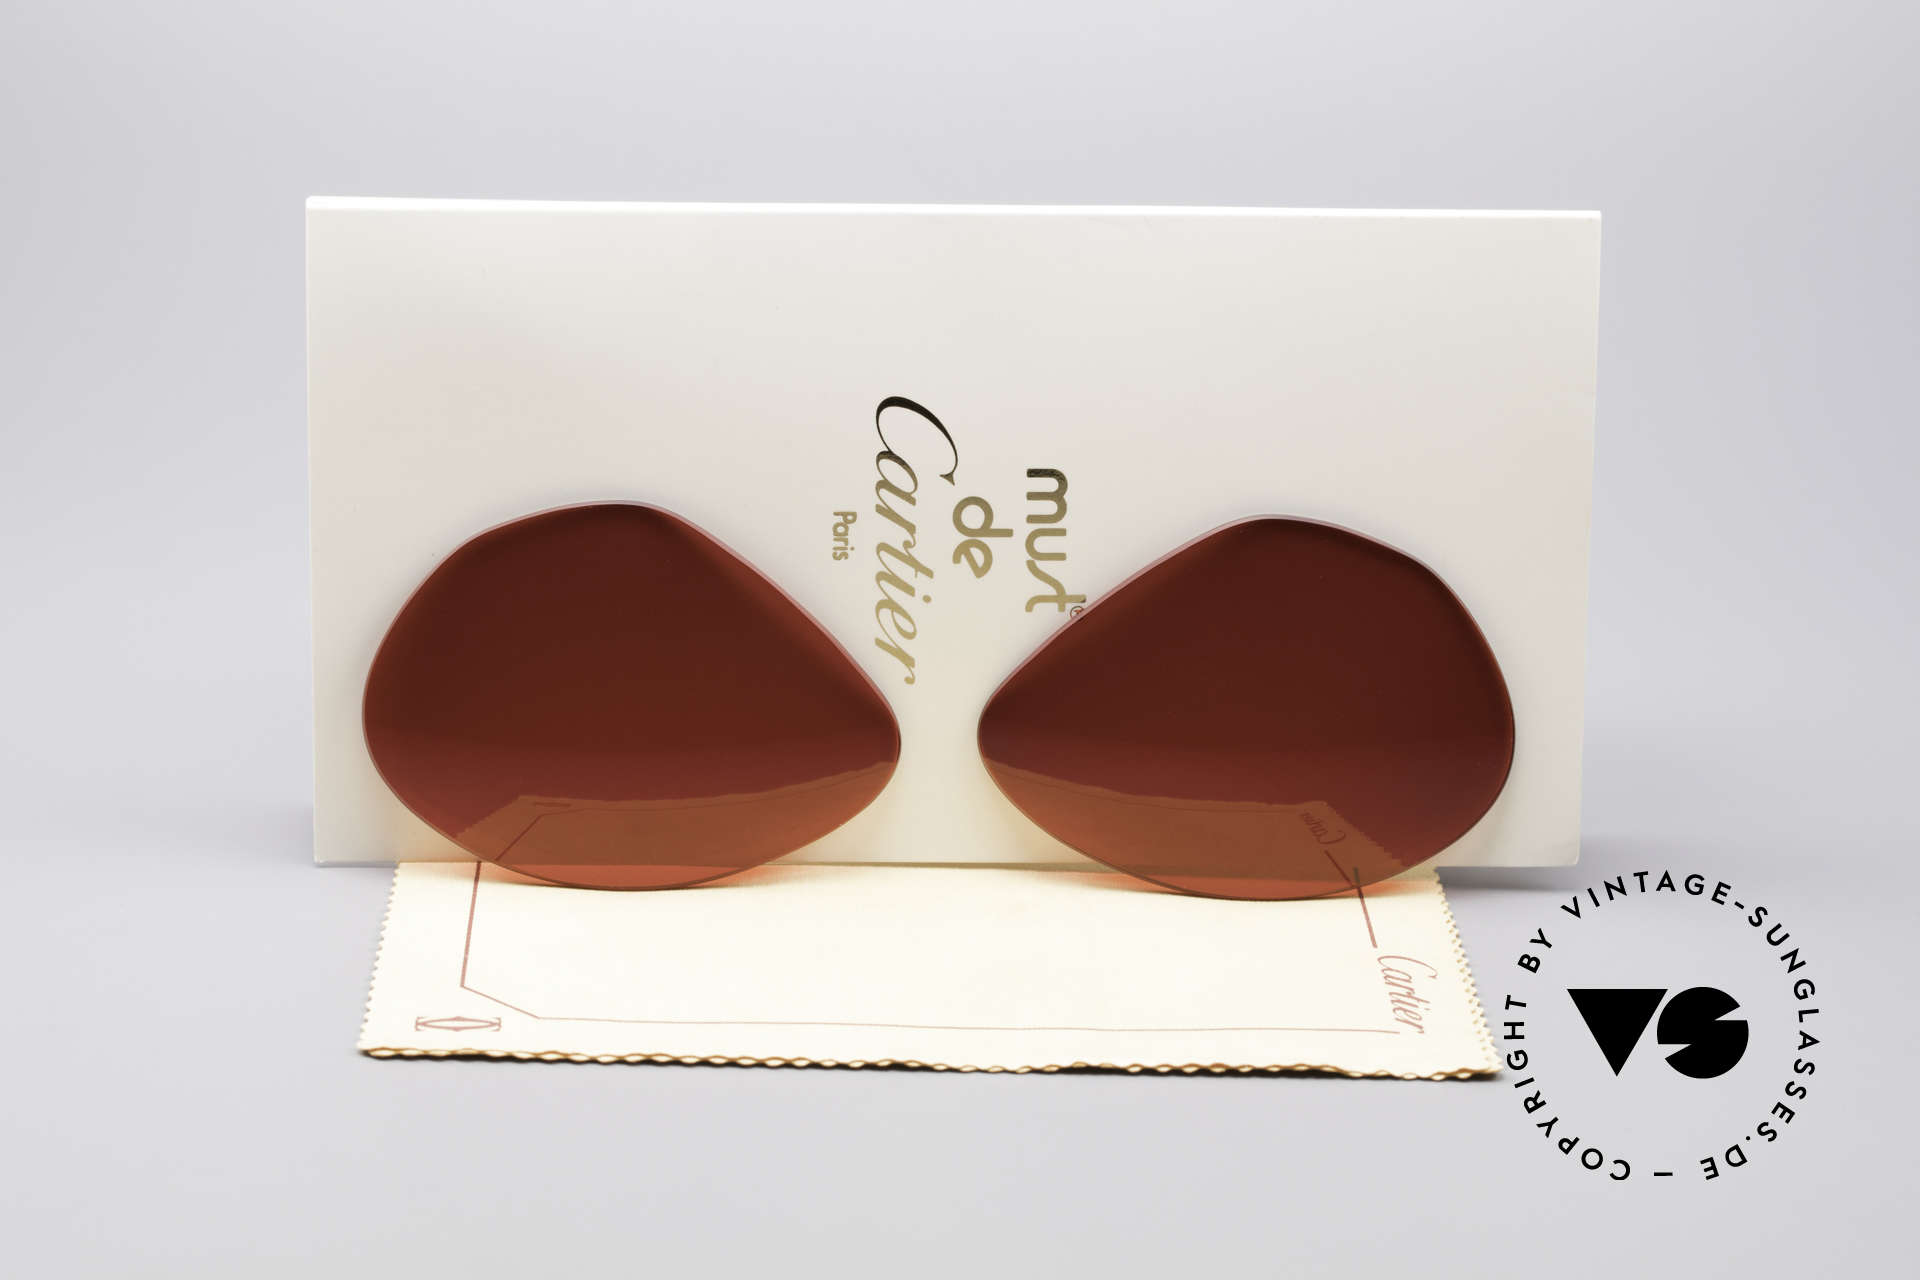 Cartier Vendome Lenses - L Sonnengläser 3D Rot, neue CR39 UV400 Kunststoff-Gläser (100% UV Schutz), Passend für Herren